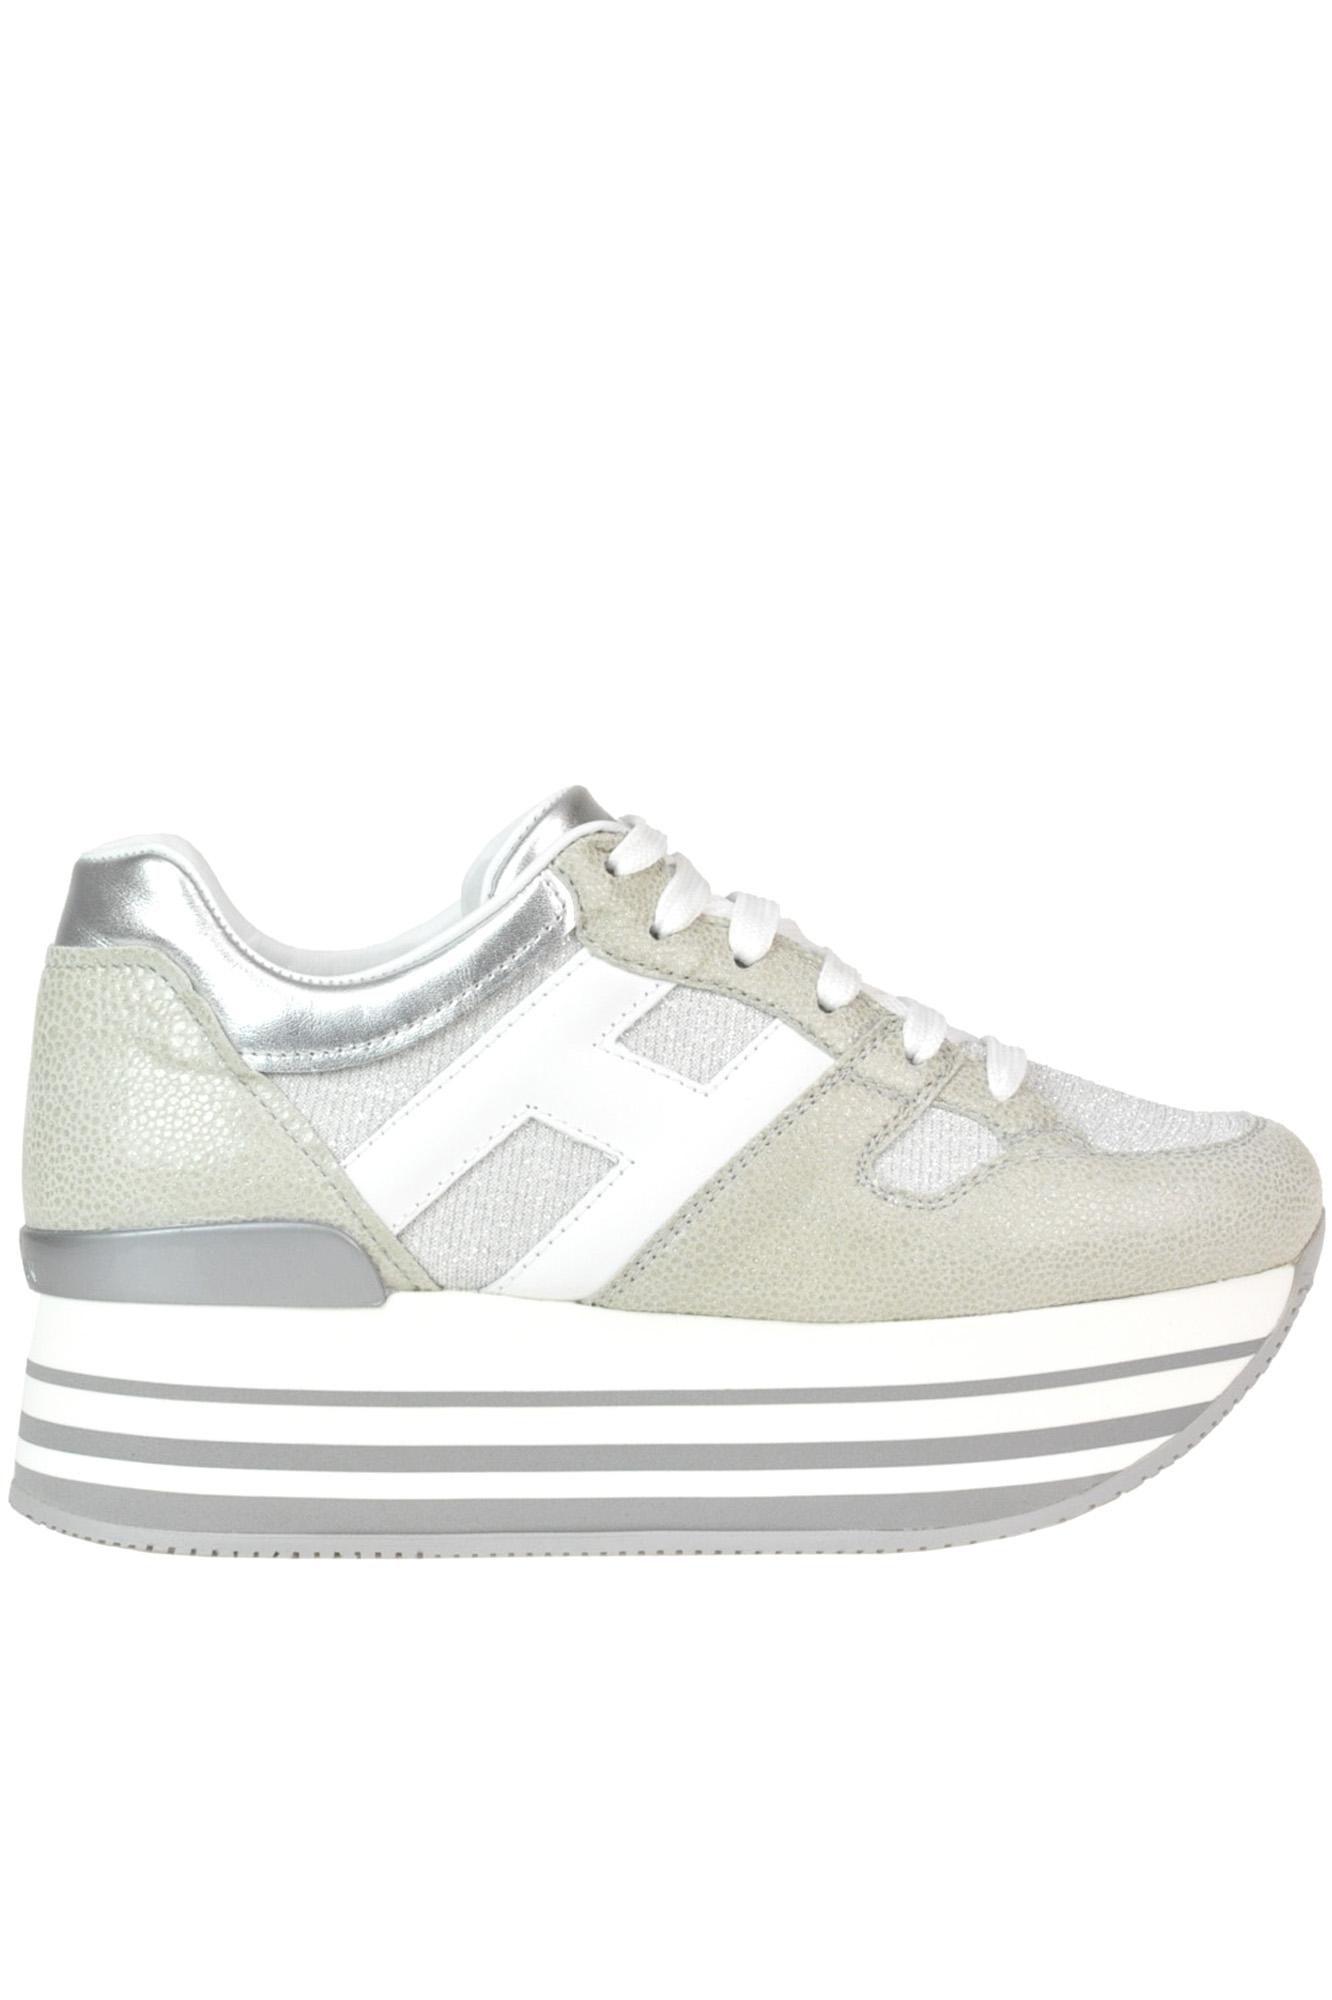 601db95d0d Hogan 'Maxi 222' Wedge Sneakers In Light Grey | ModeSens